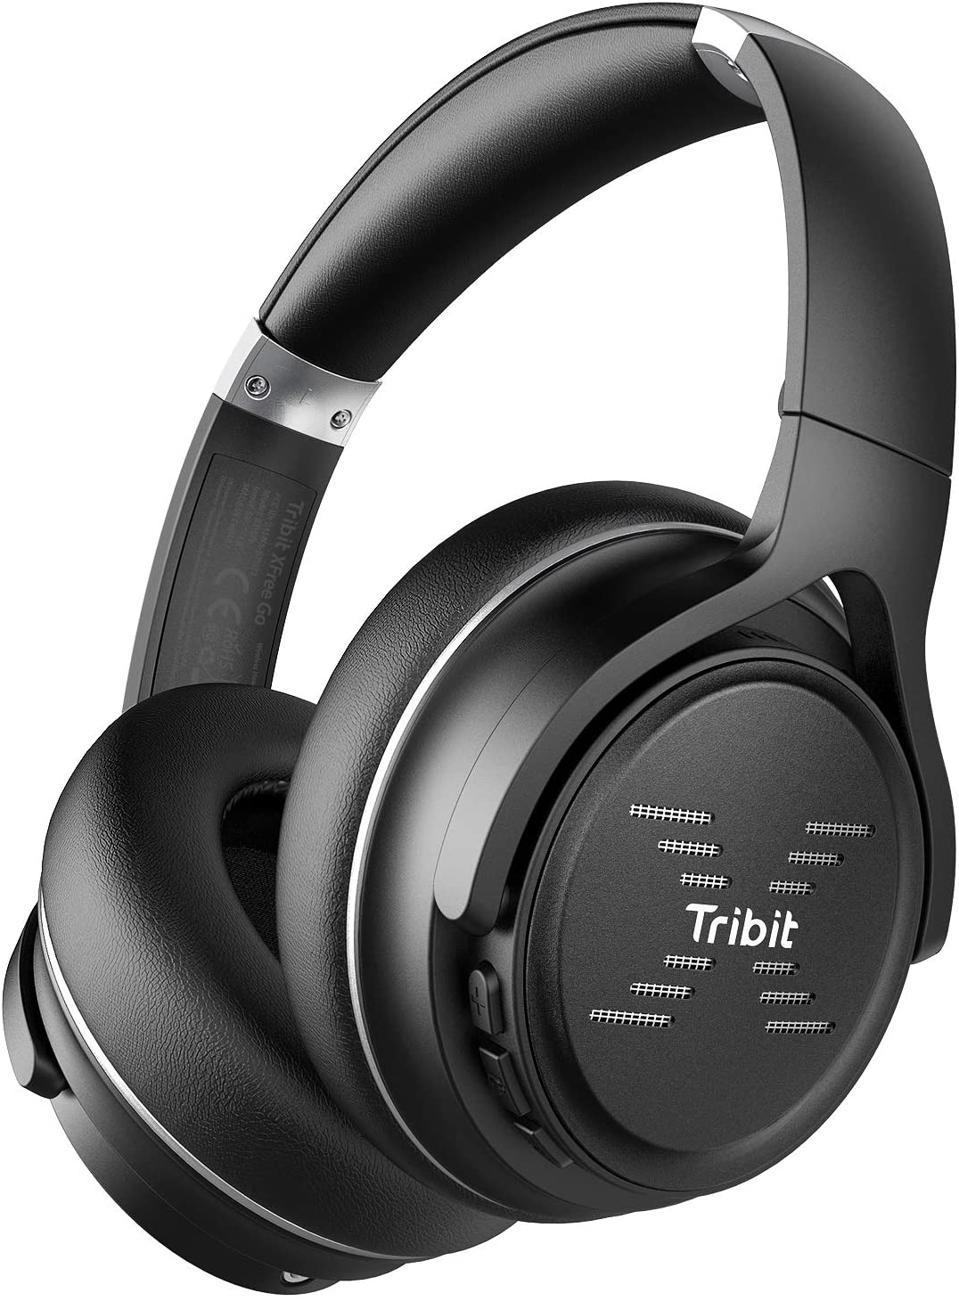 Tribit XFree Go headphones